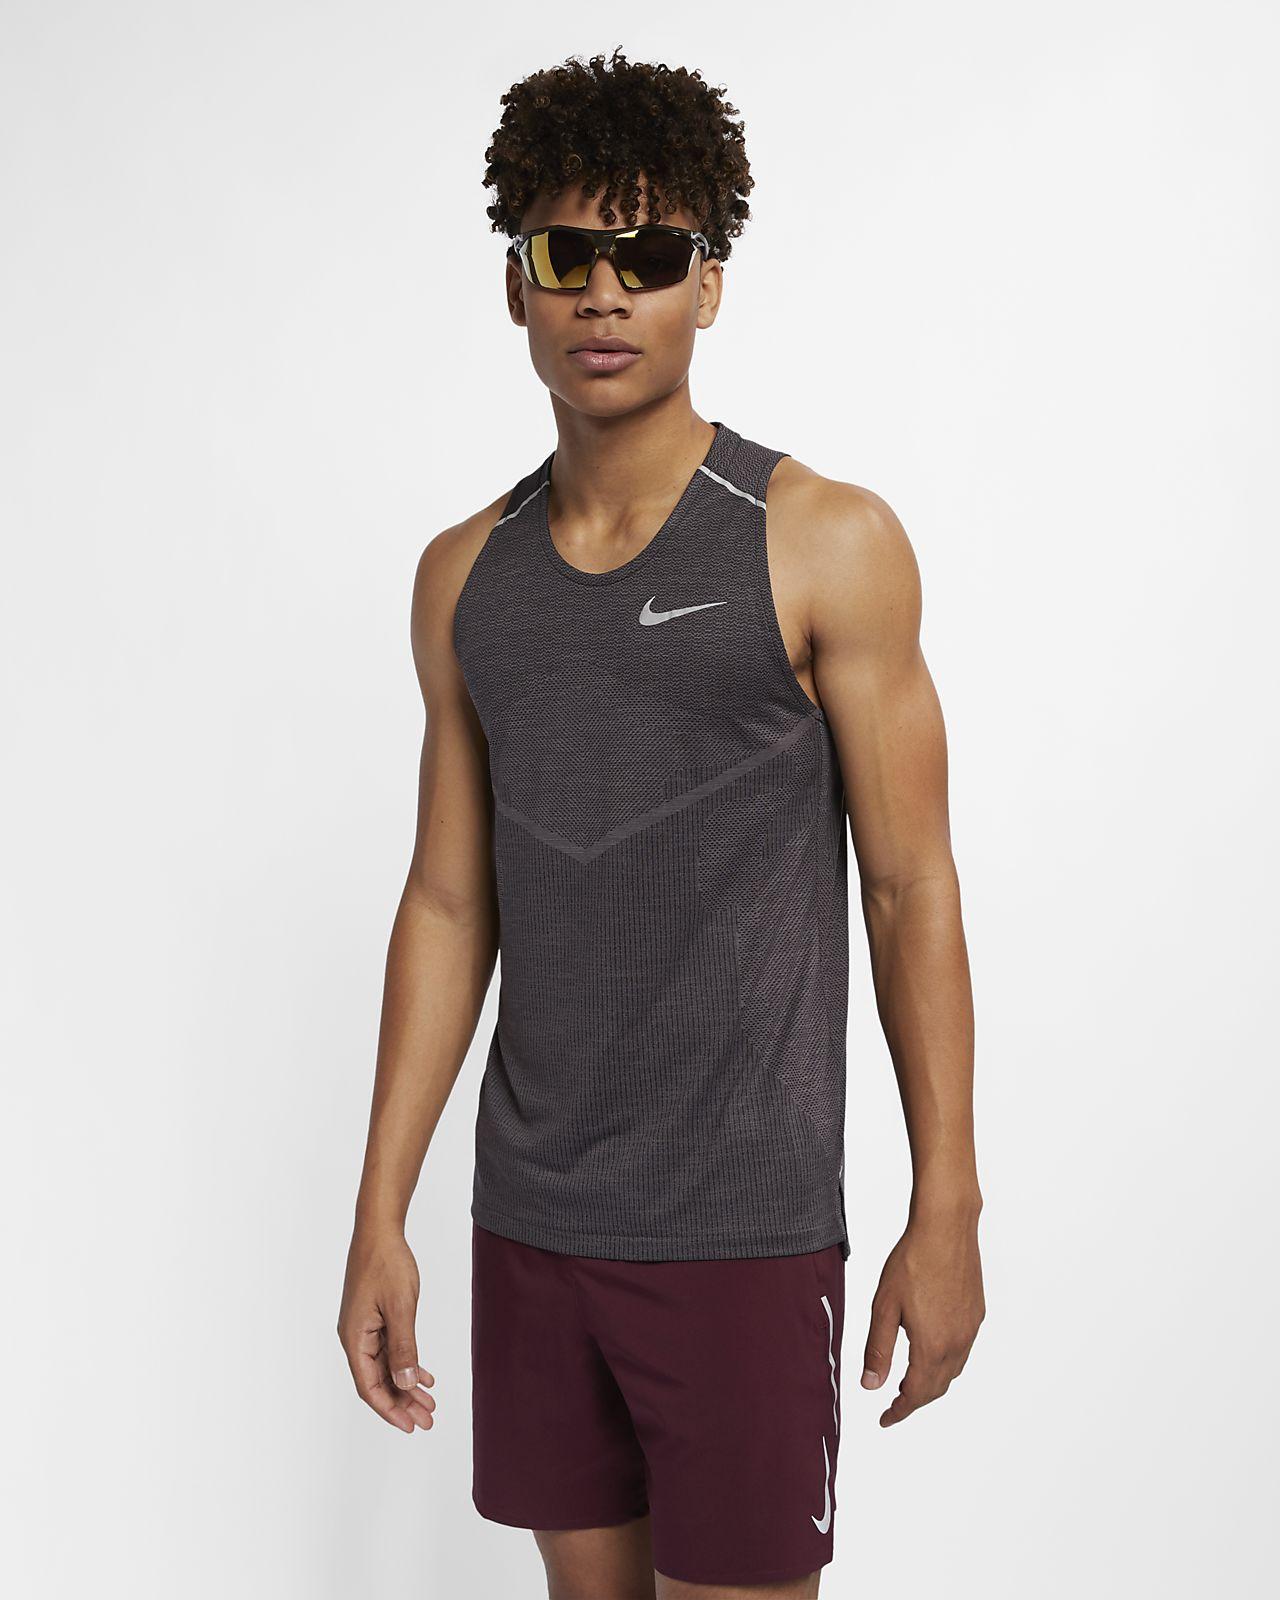 Camisola de running sem mangas Nike TechKnit Cool para homem